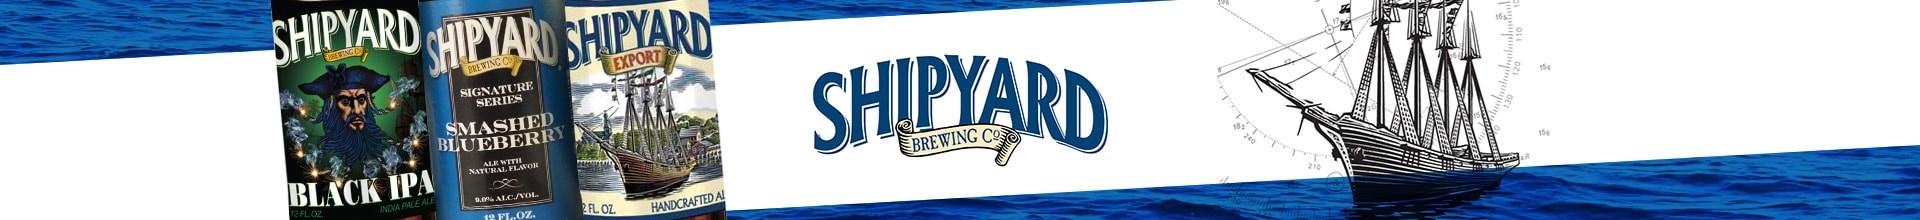 Cervejaria Shipyard